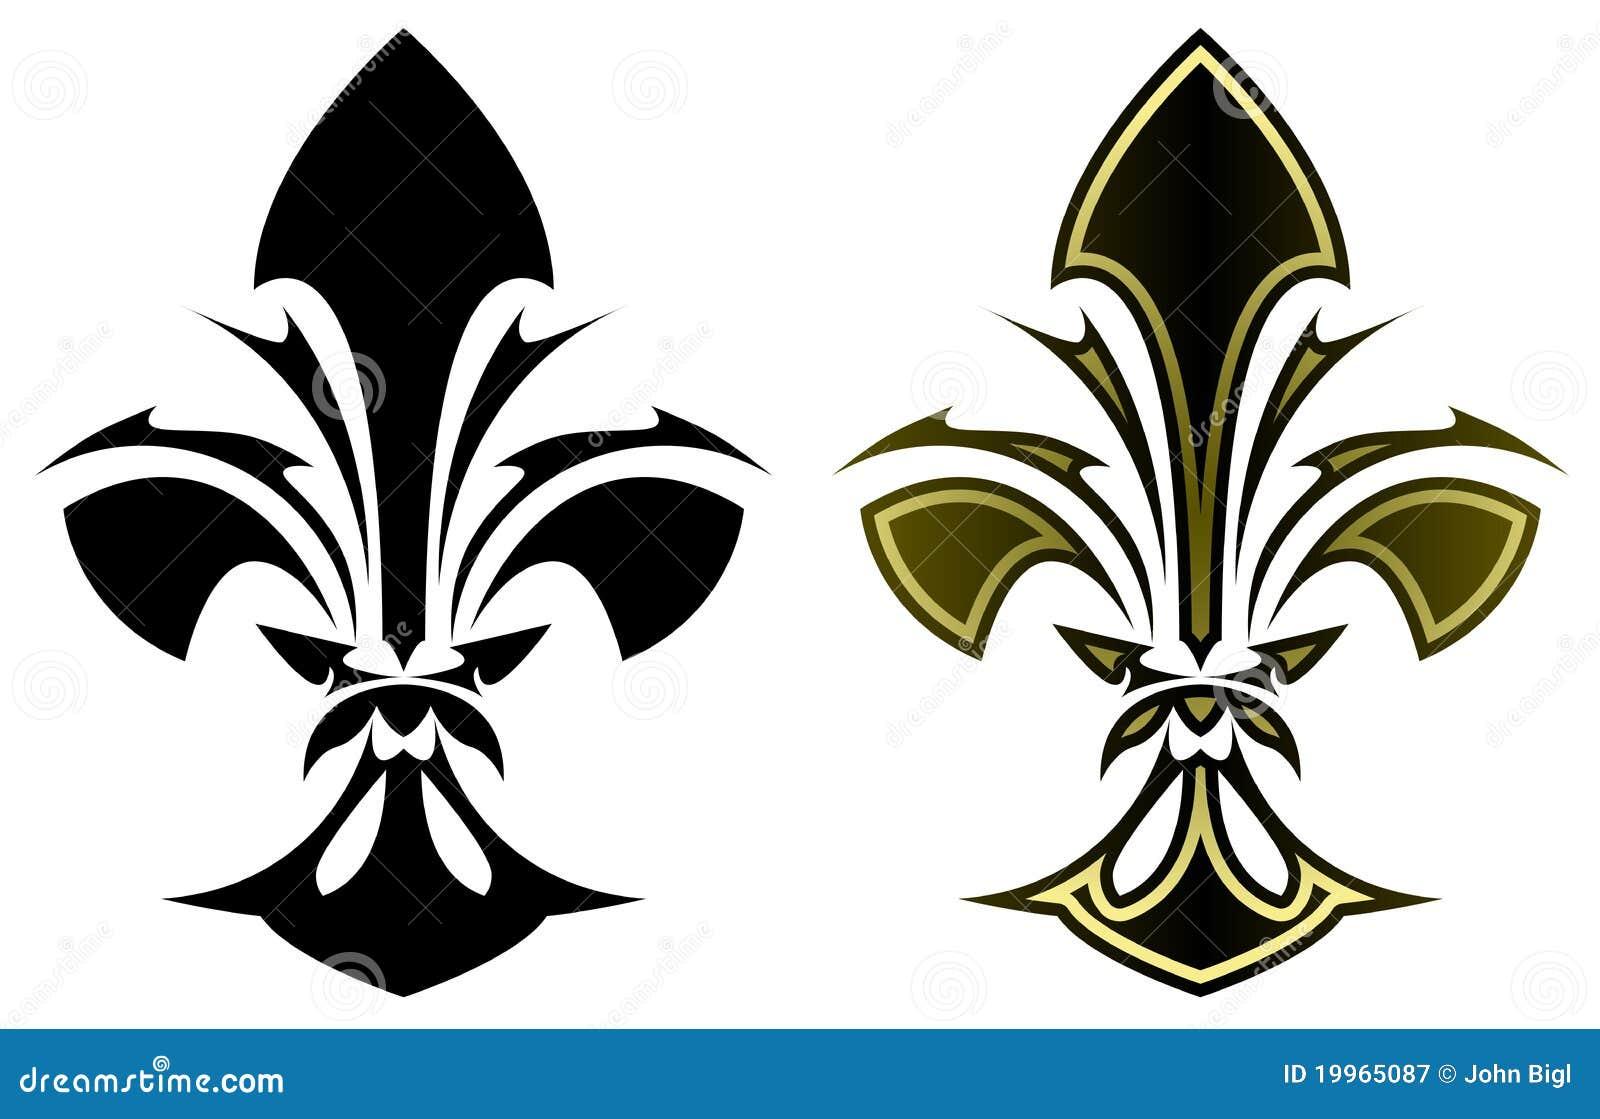 Fleur De Lys Tattoo Stock Vector Illustration Of Symbol 19965087